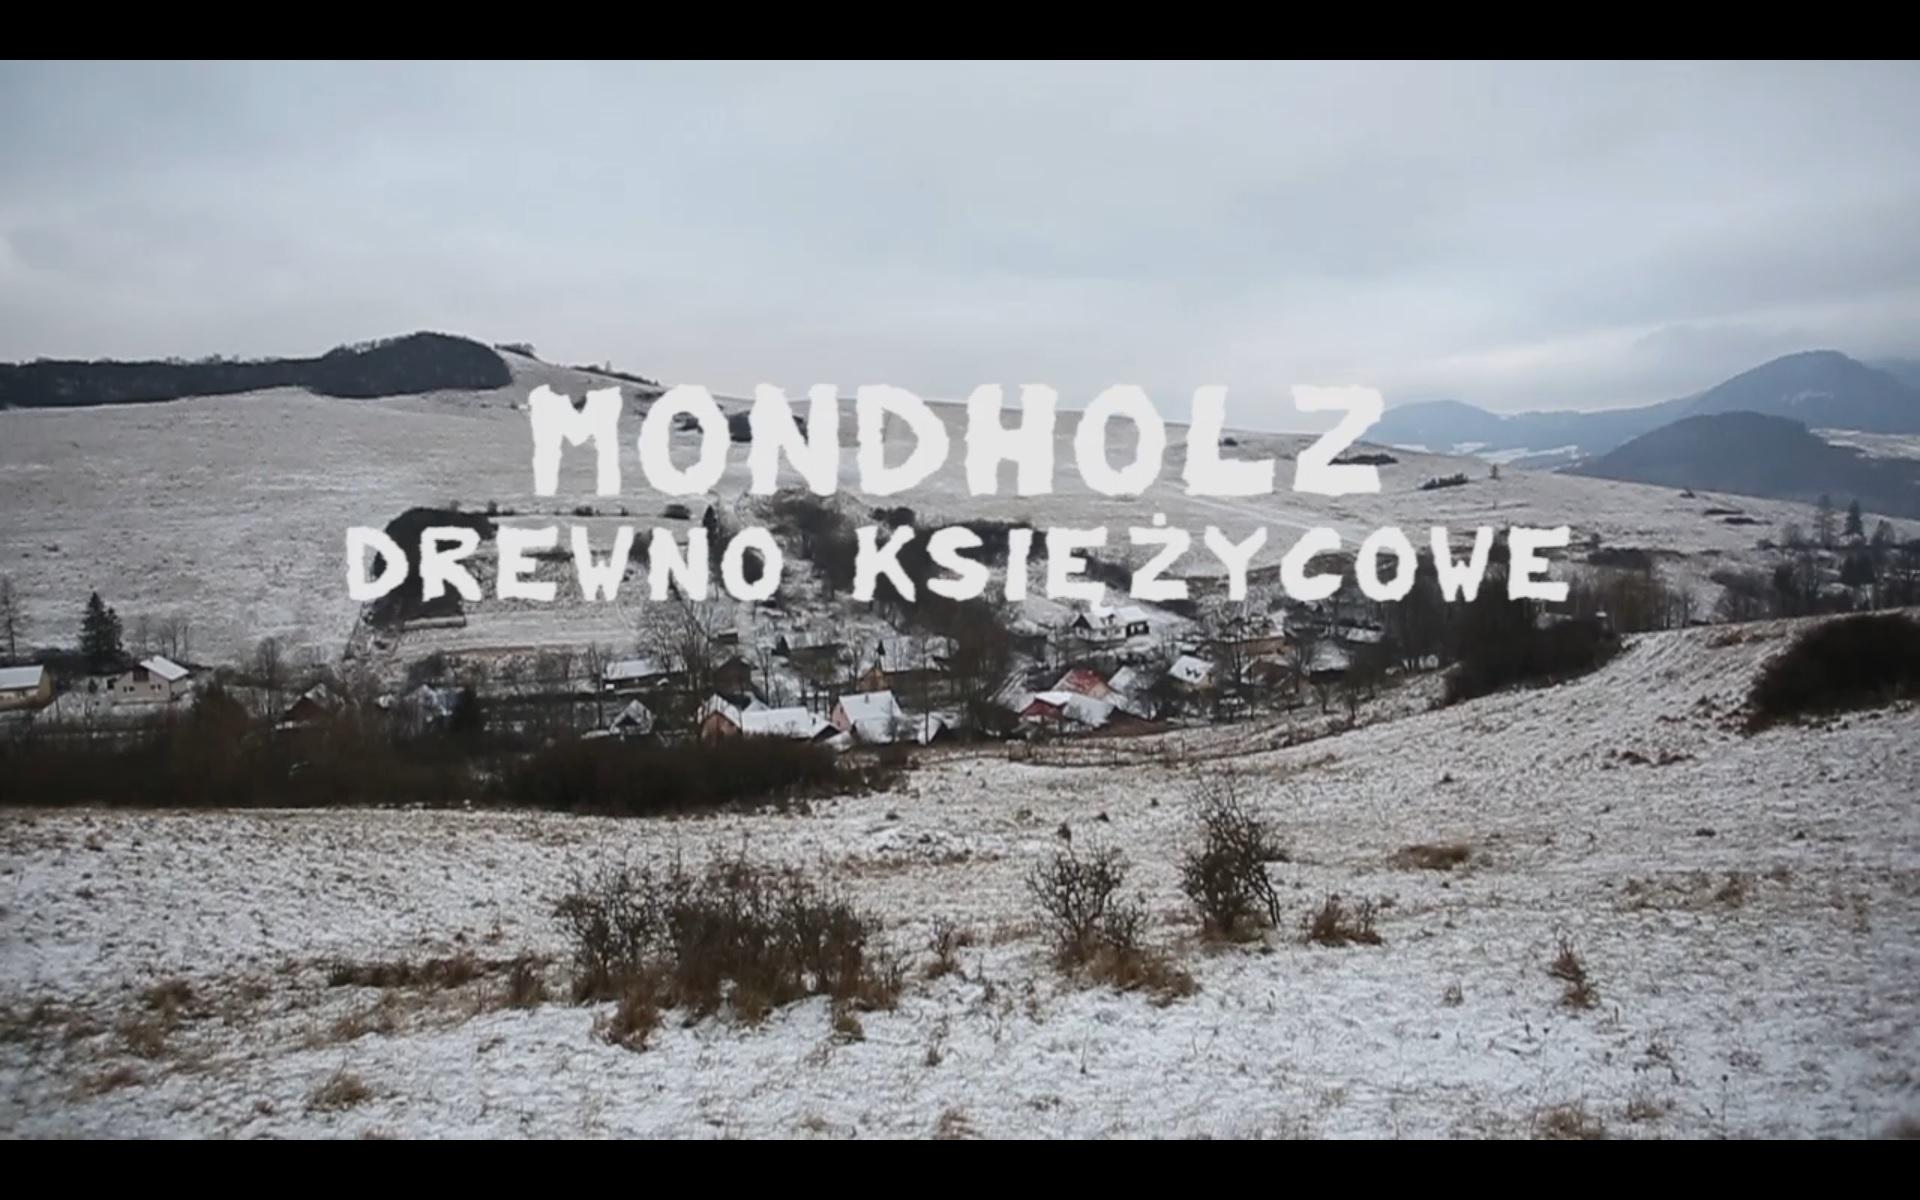 filmmondholz1